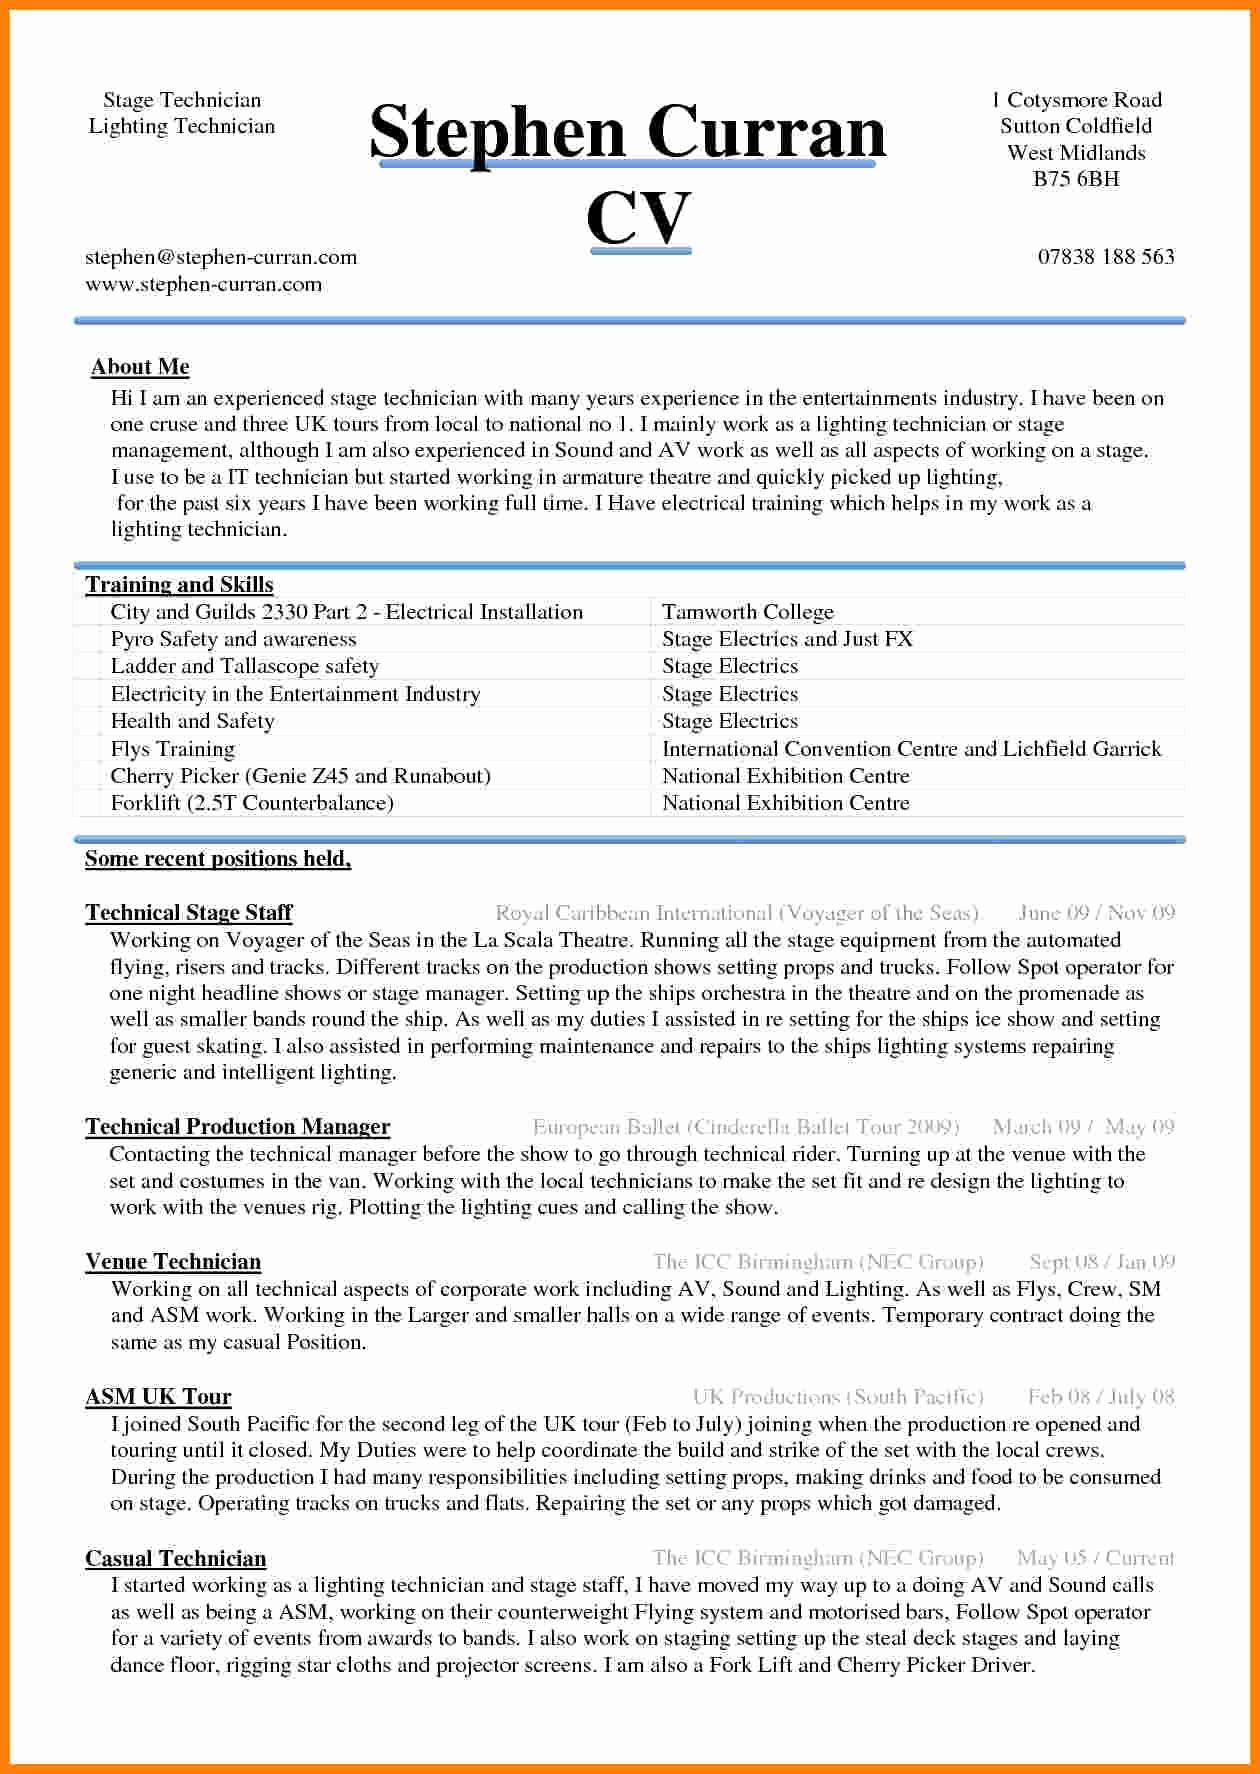 Cv format Samples In Word New 5 Cv Sample Word Document